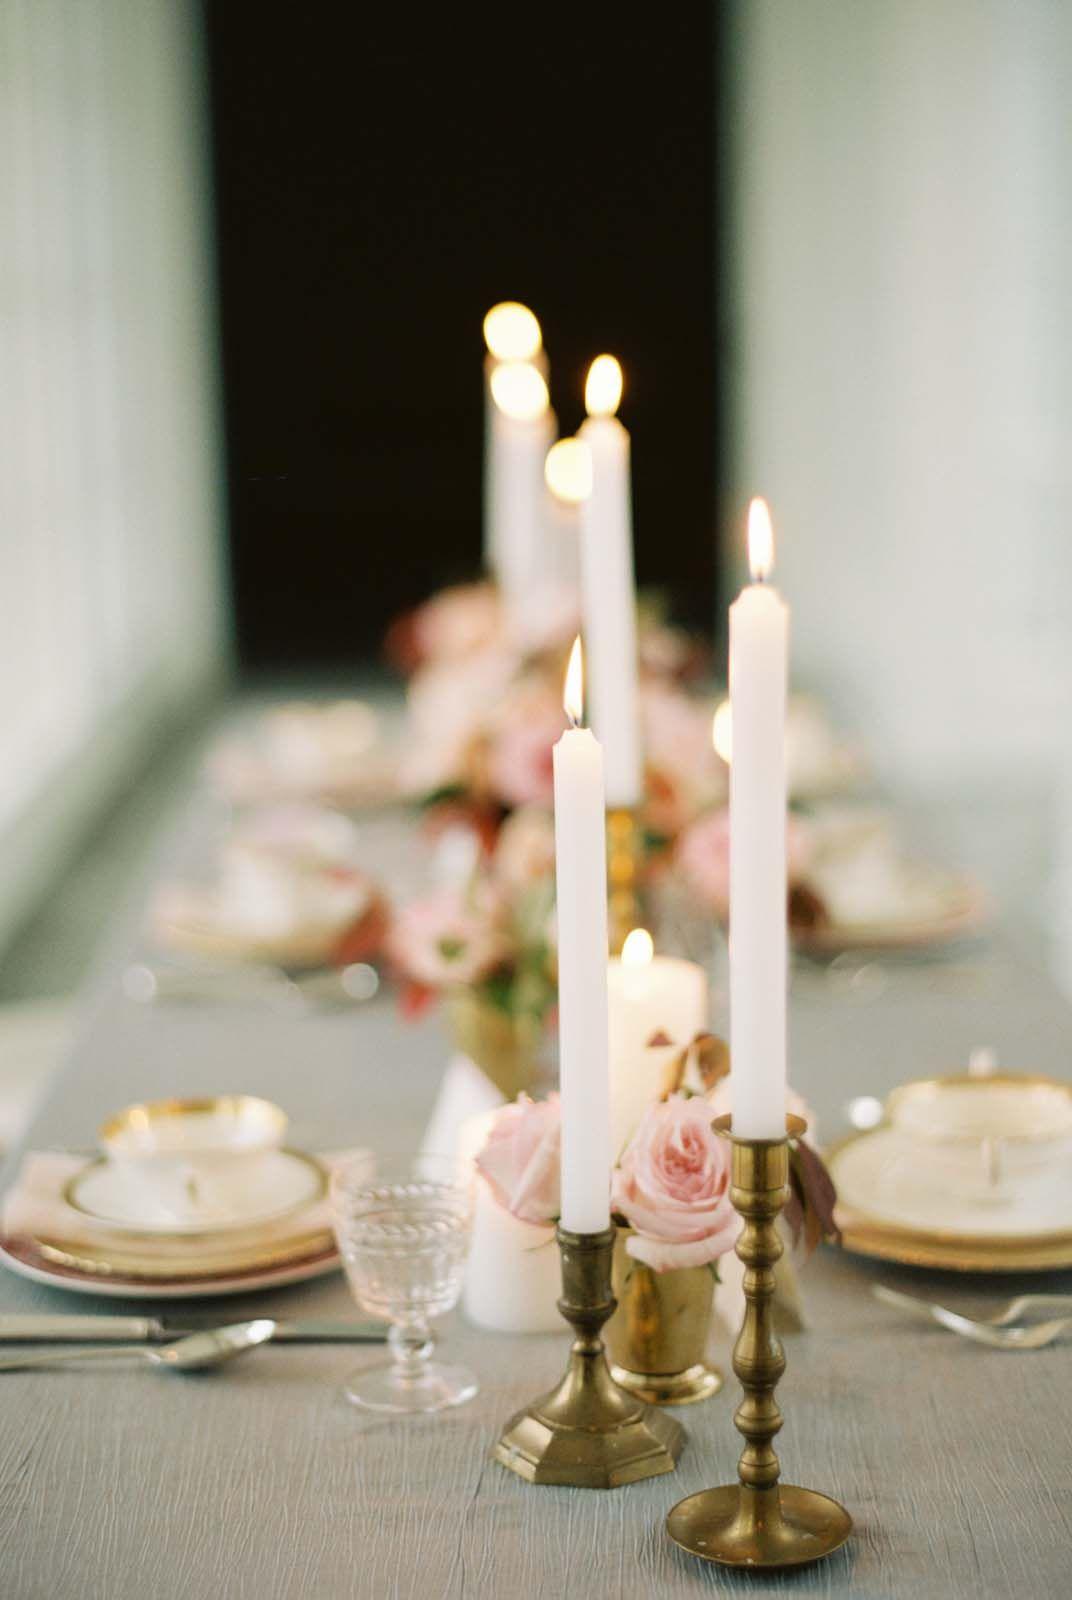 Styling and florals by Mallory Joyce, image by Elisa Bricker. #wedding www.weddingsunveiledmagazine.com